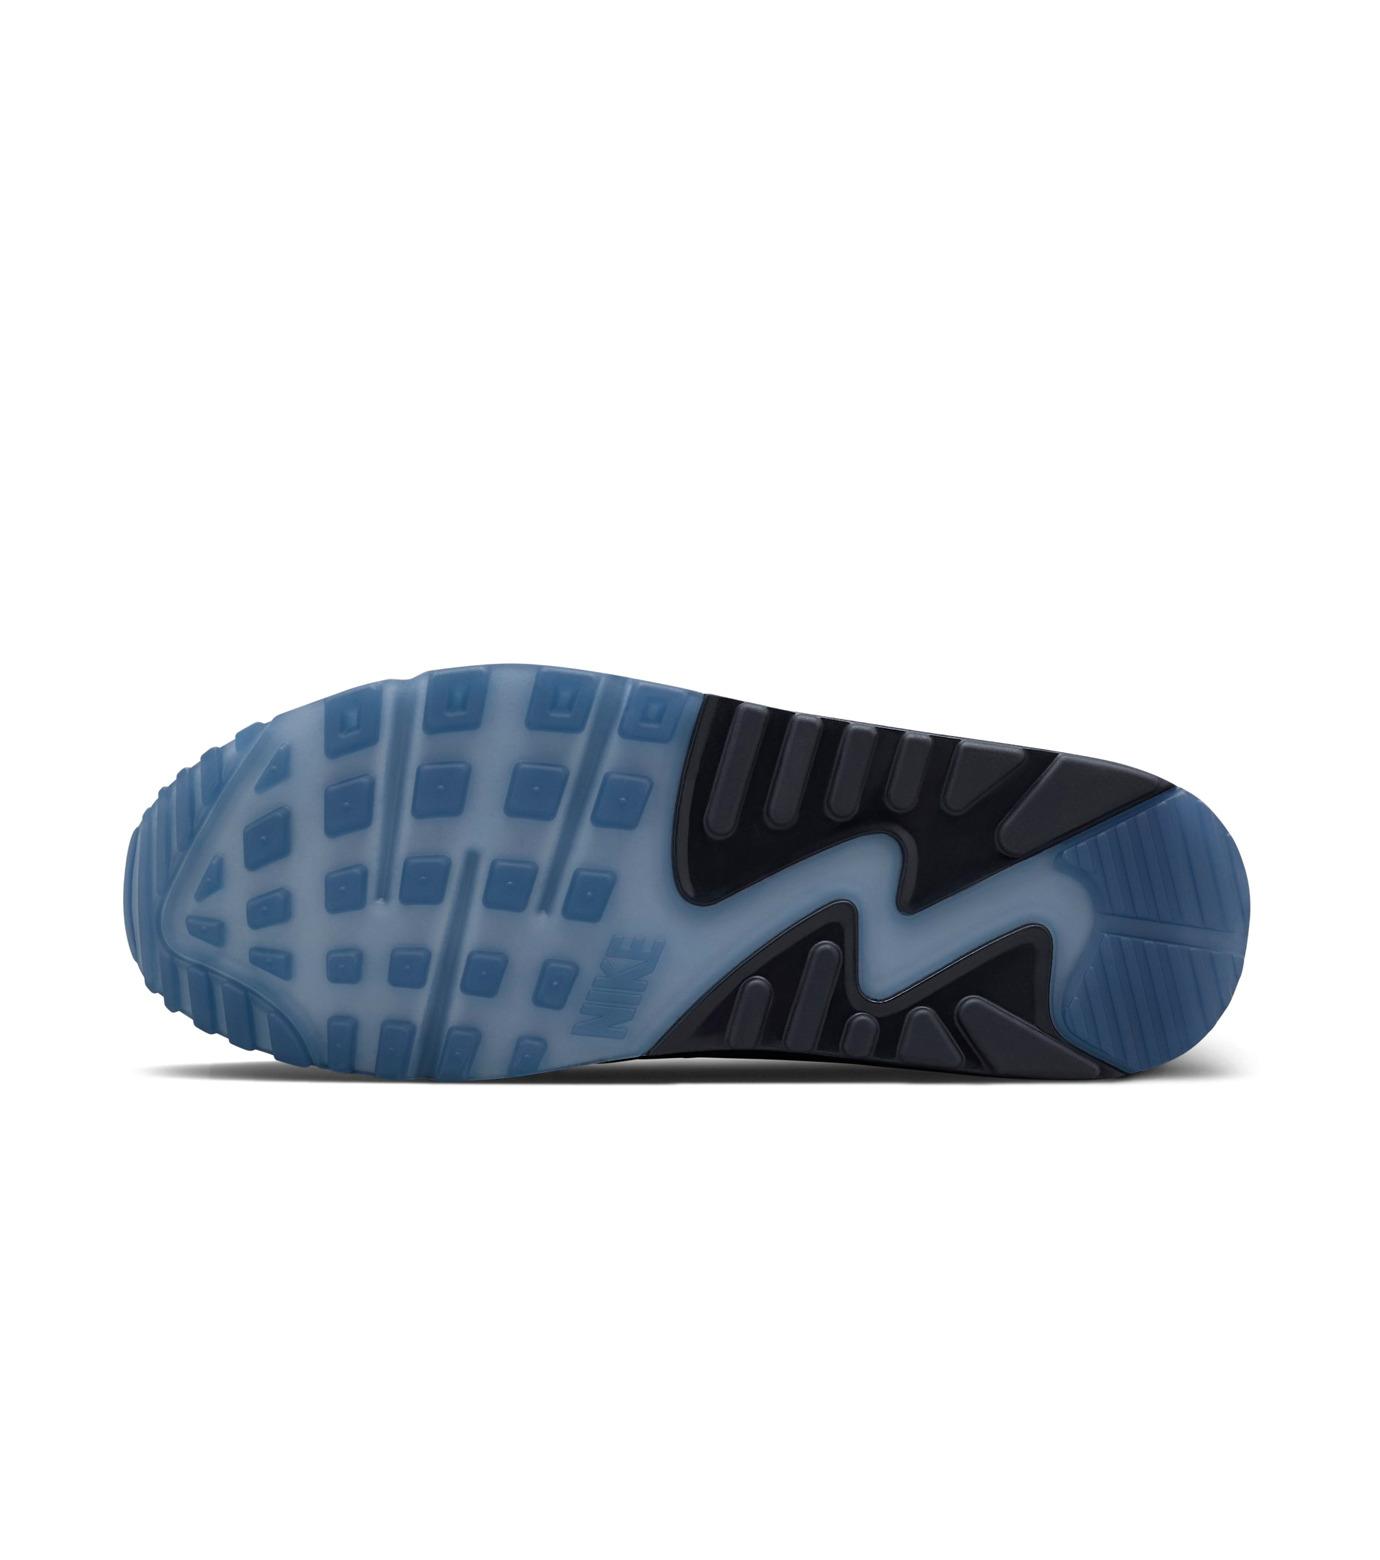 NIKE(ナイキ)のWMNS AIR MAX PEDRO LOURENCO-BLUE(シューズ/shoes)-867116-400-92 拡大詳細画像2